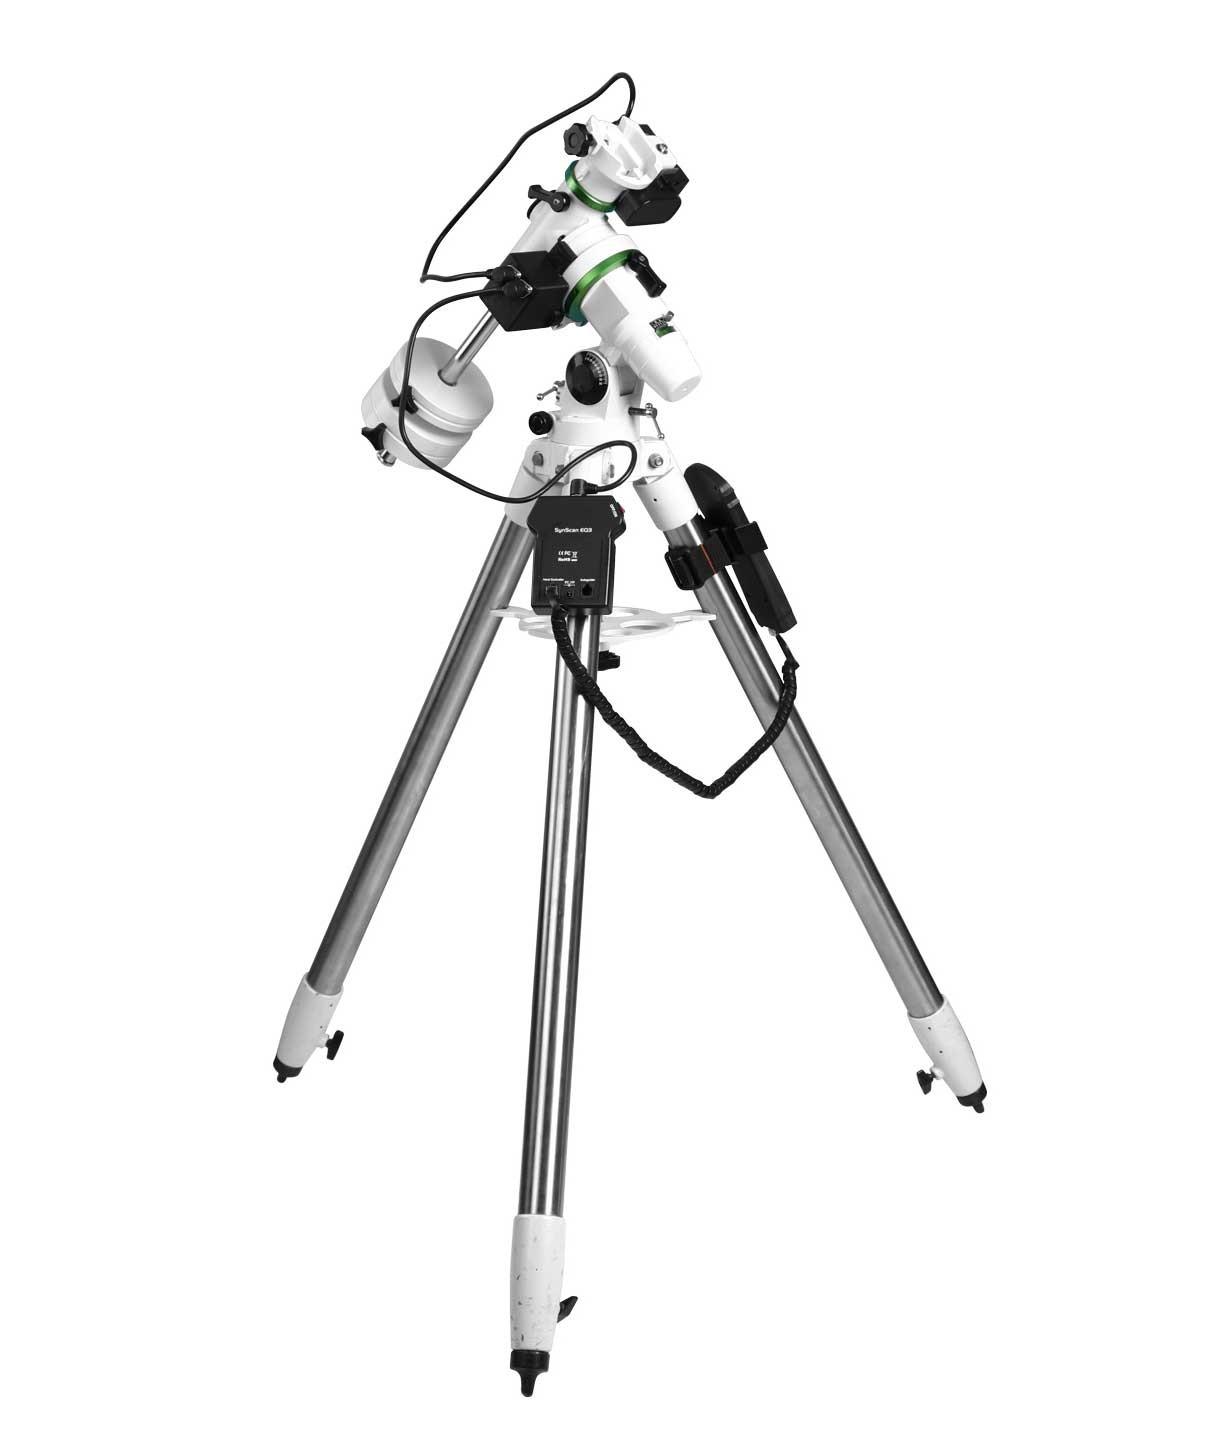 Sky-Watcher EQM35 GoTo Combo Mount with Steel Tripod